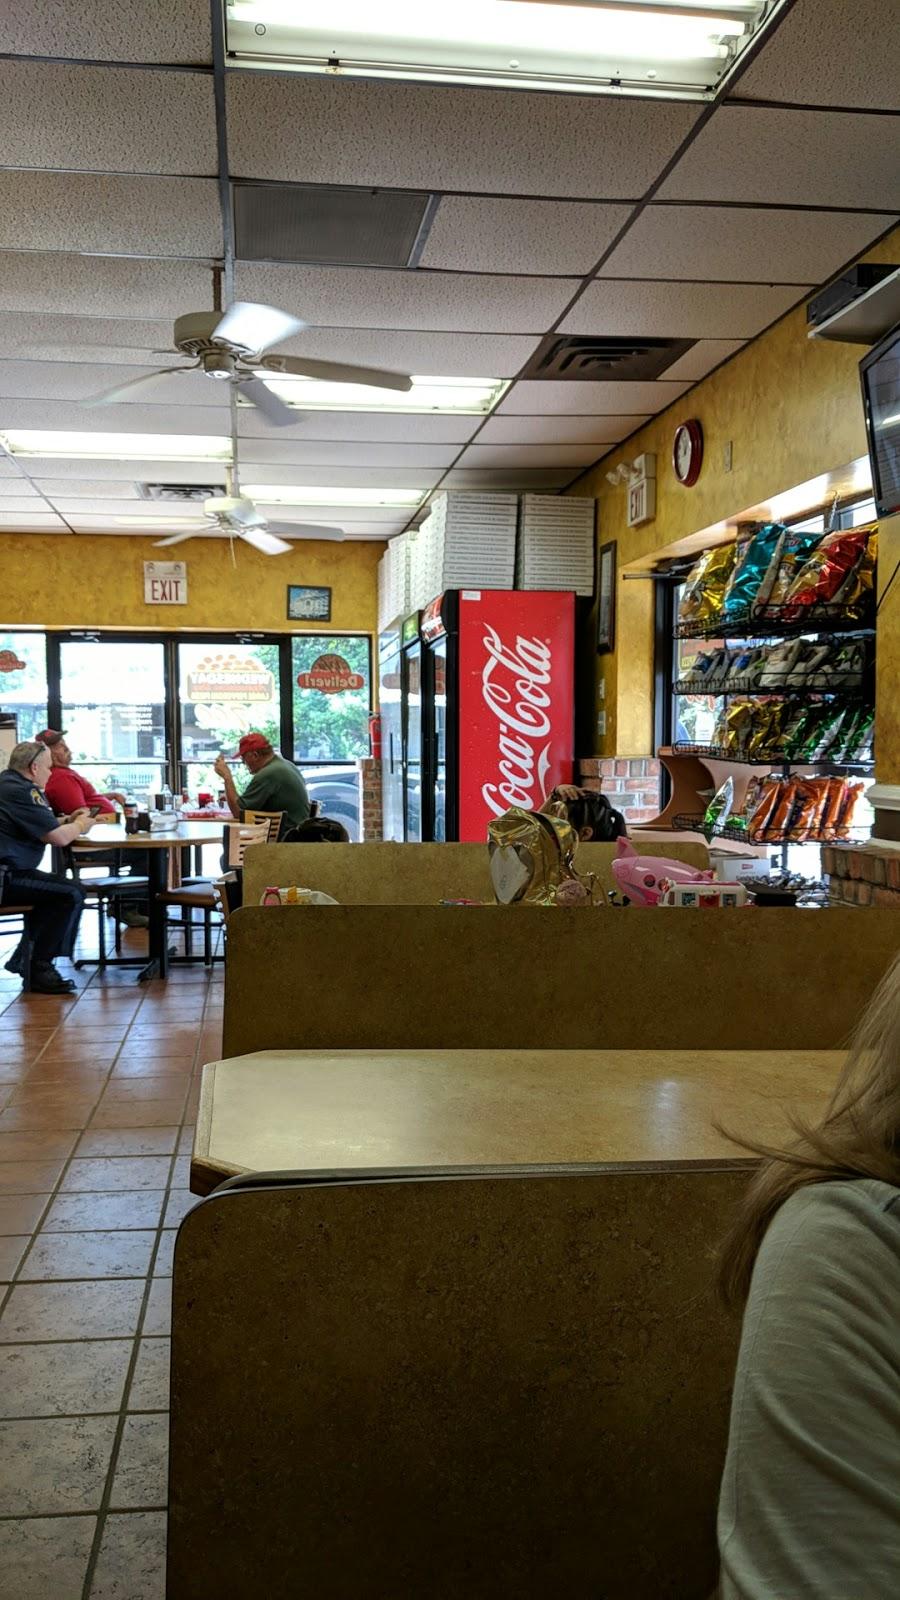 La Matesina Pizza Pasta - restaurant  | Photo 1 of 10 | Address: 504 5th St, Delaware City, DE 19706, USA | Phone: (302) 836-1855